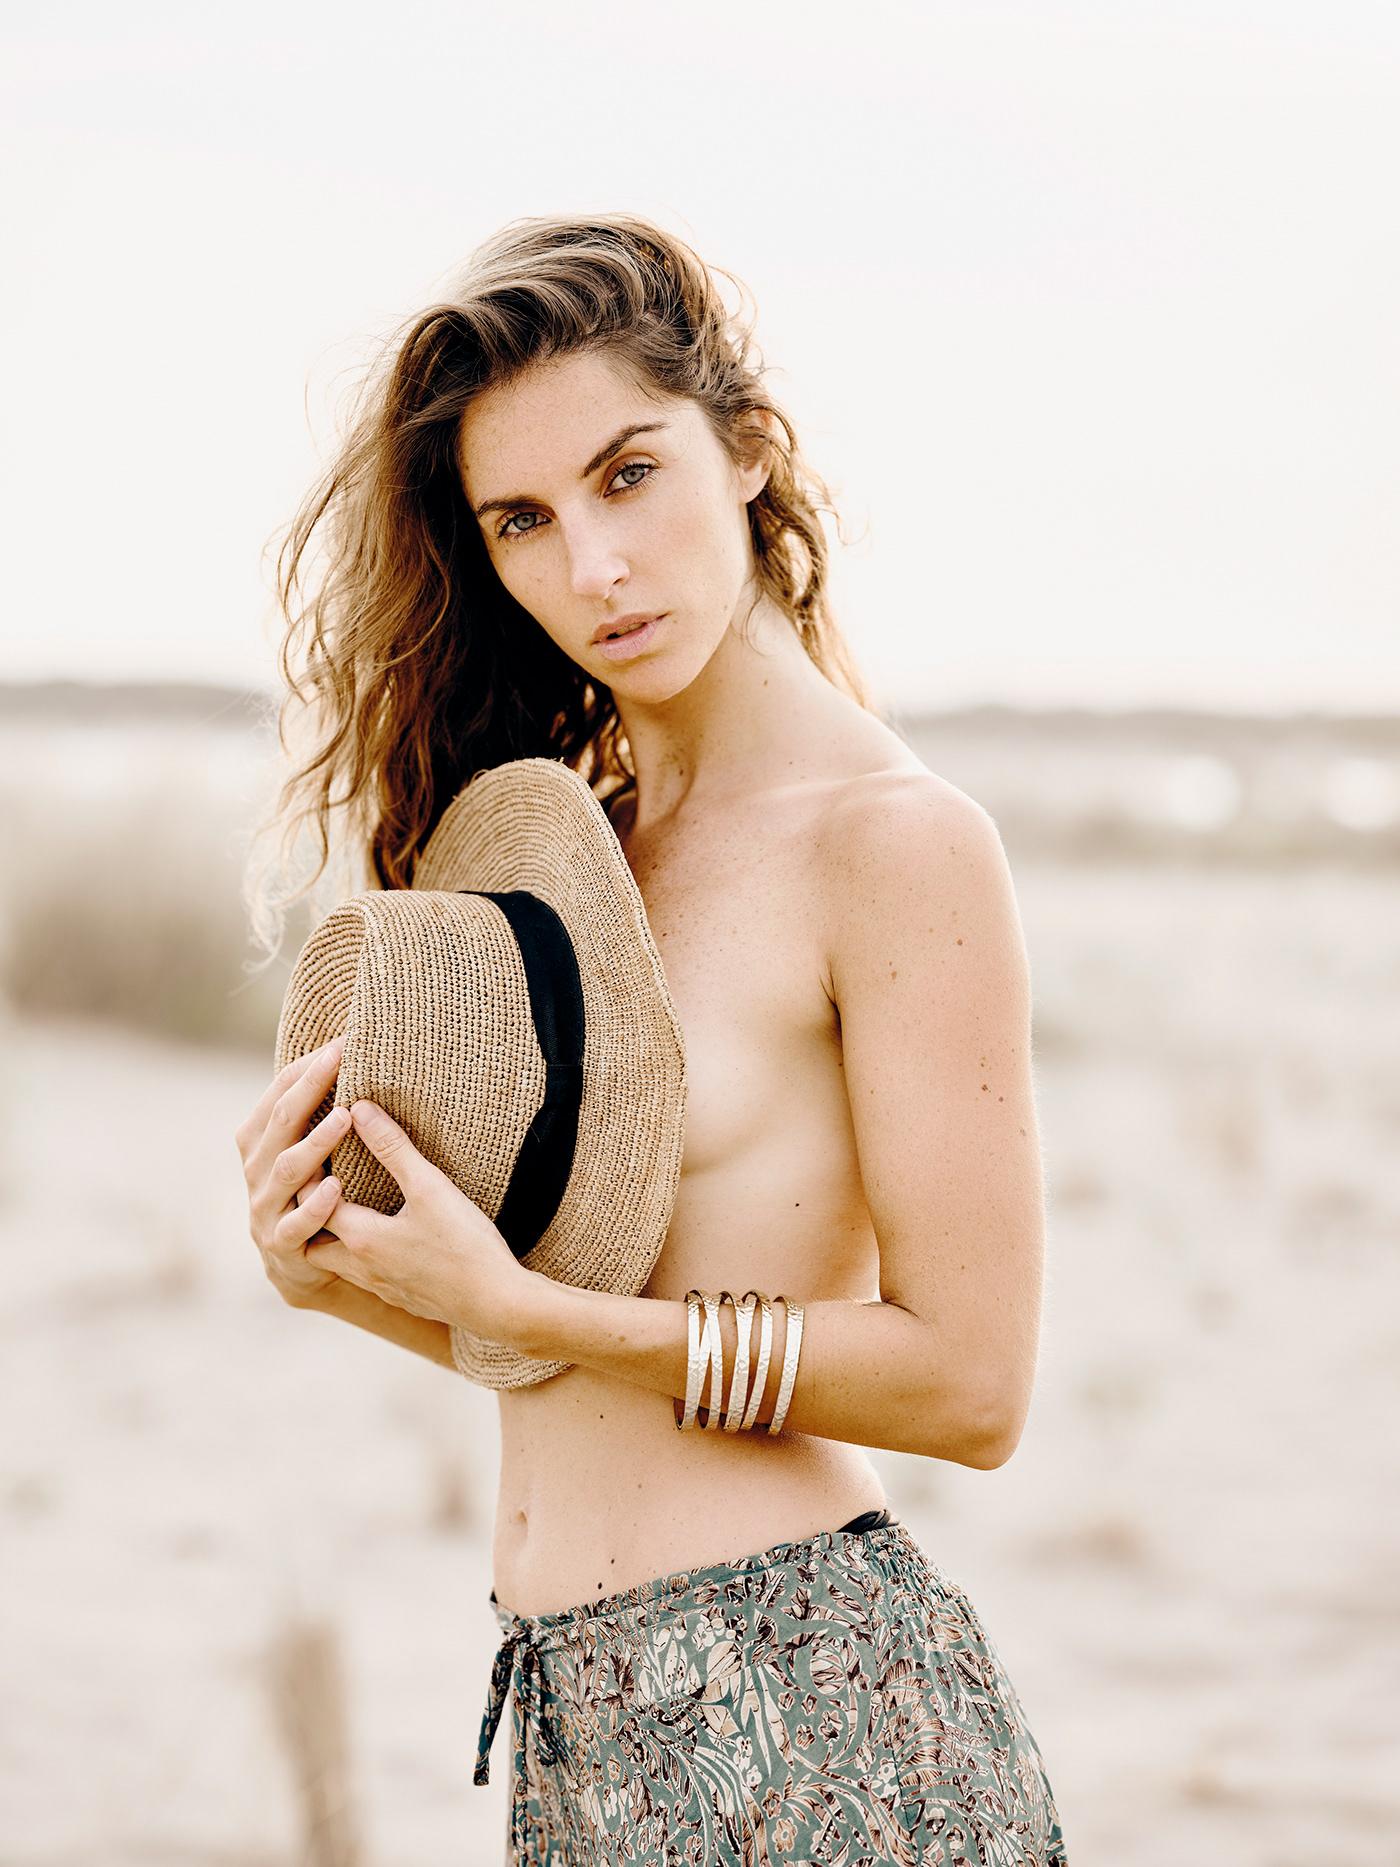 The Beach / фотограф MarcKus Milo - Marco Milillo